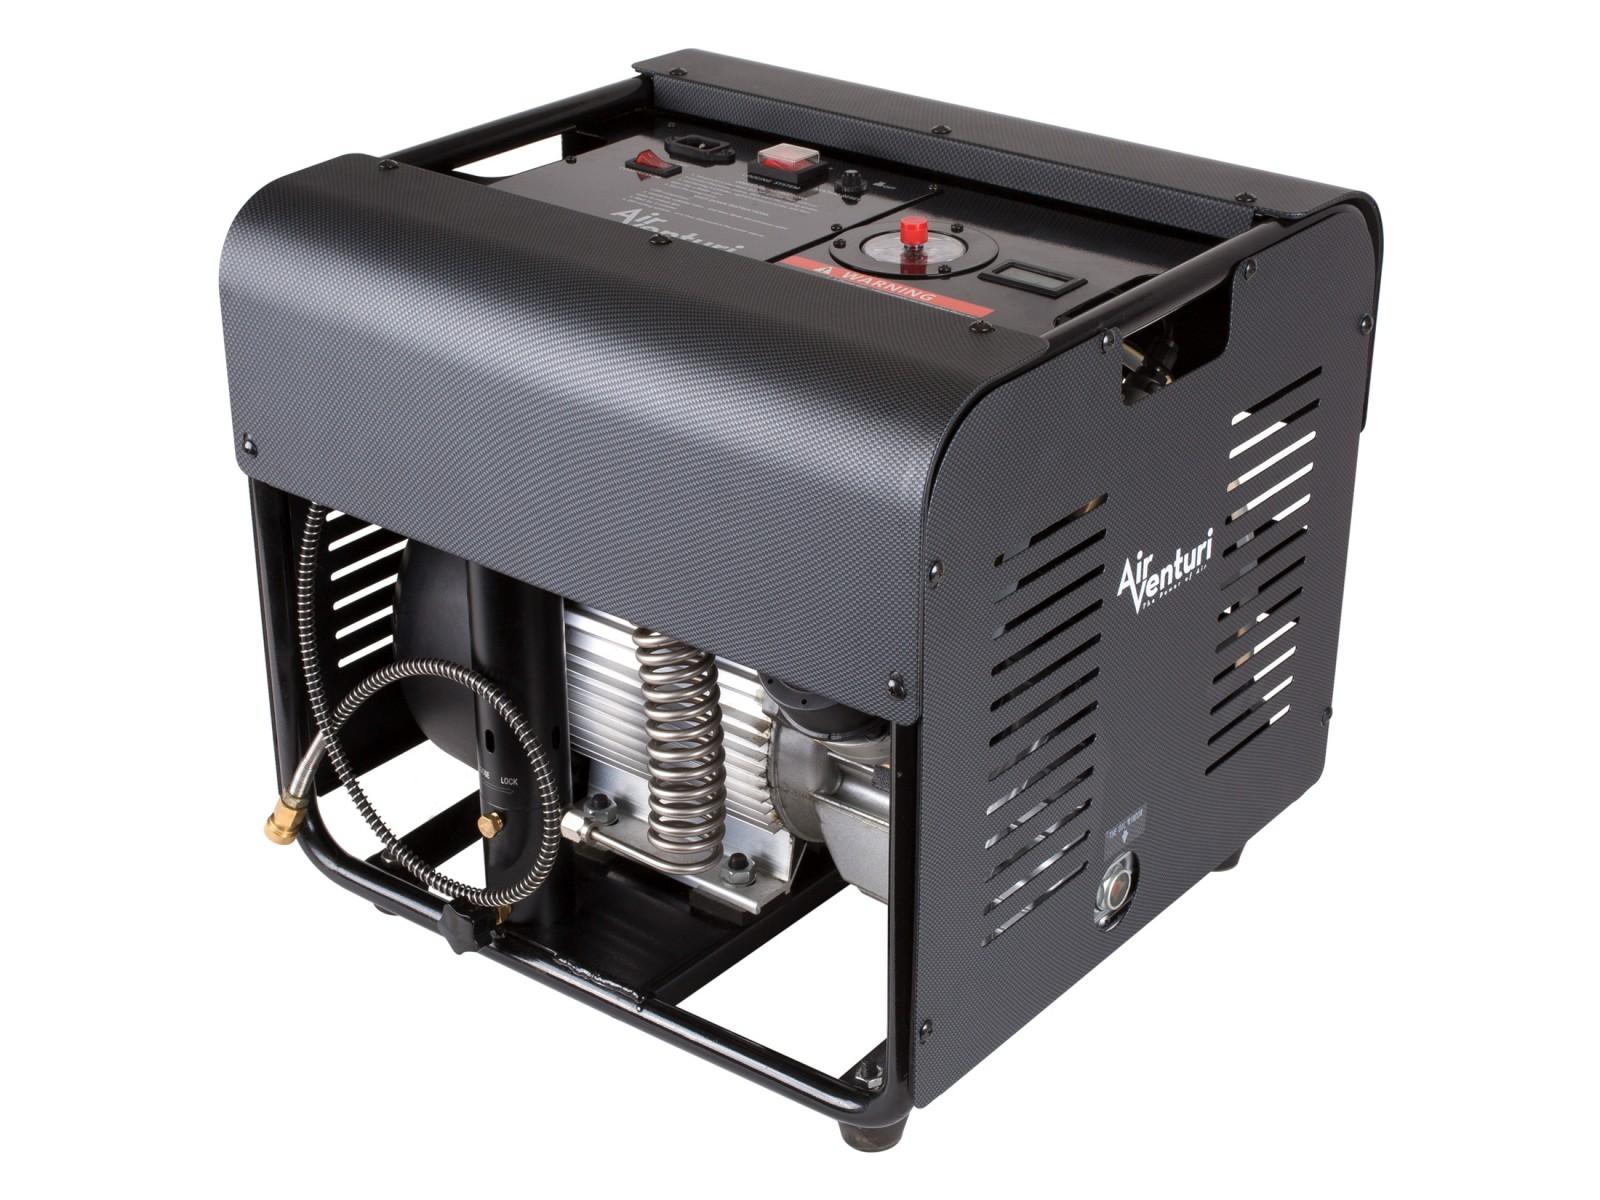 Air Venturi Air Compressor, Electric, 4500 PSI/310 Bar